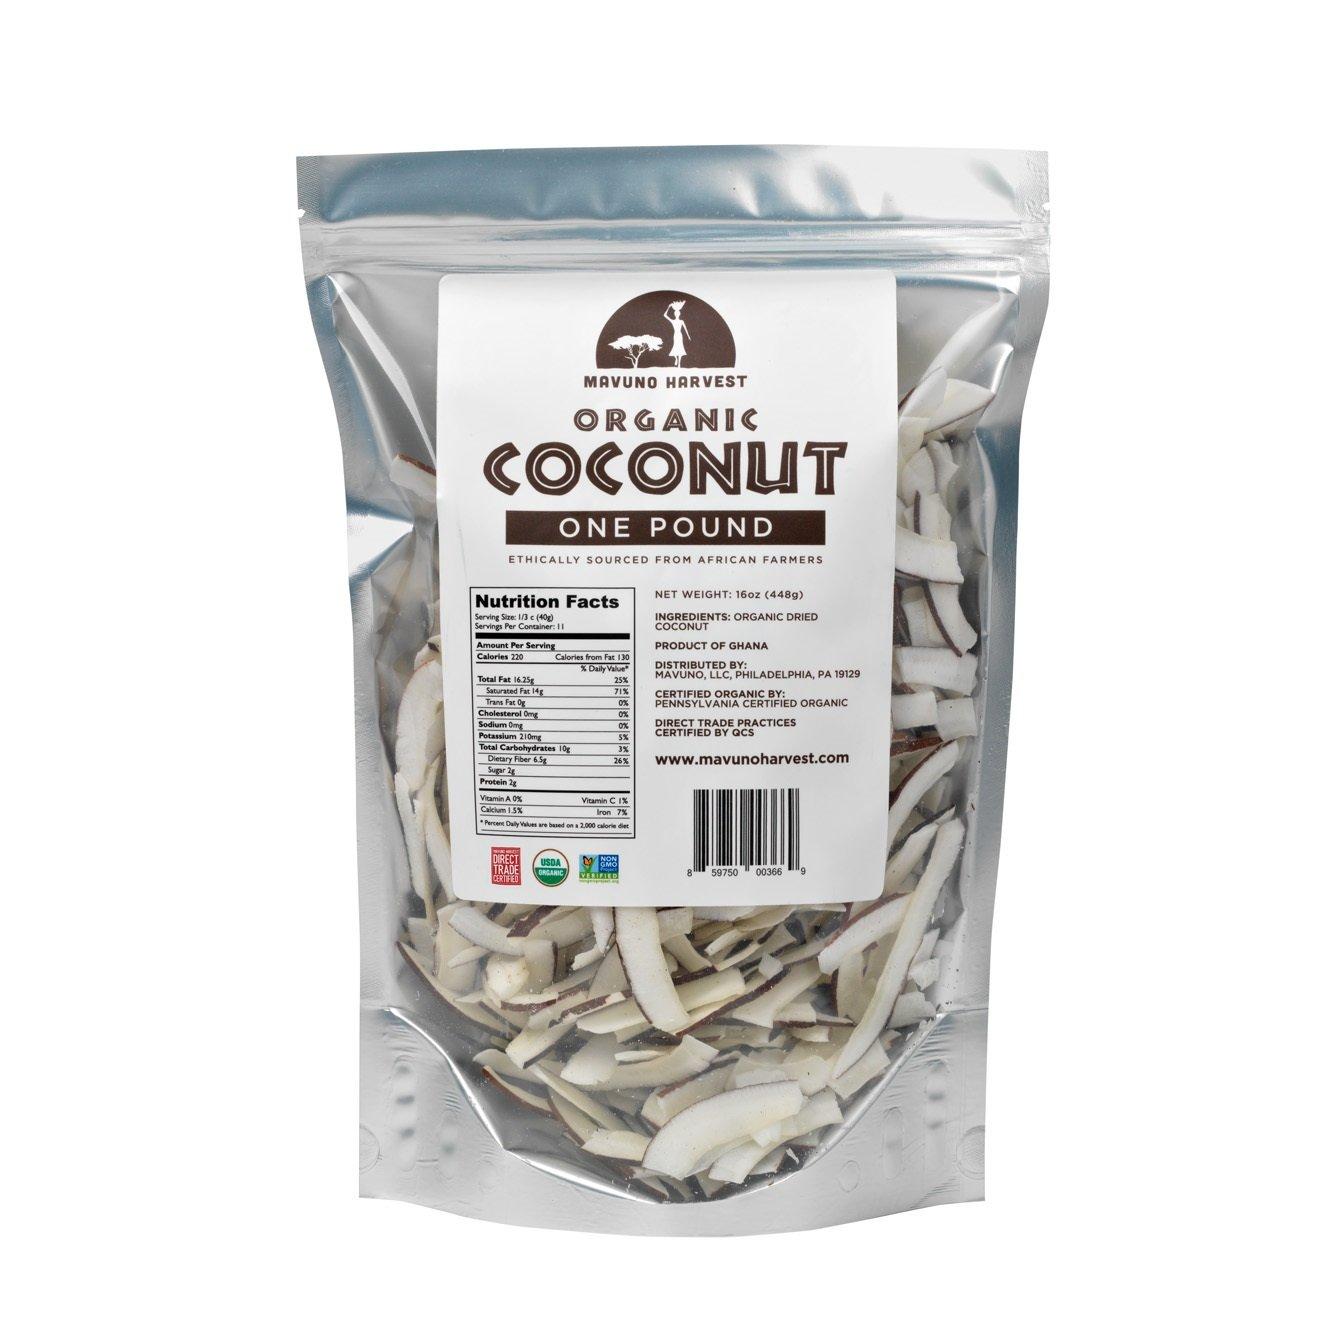 Mavuno Harvest Direct Trade Organic Dried Fruit, Coconut, 1 Pound